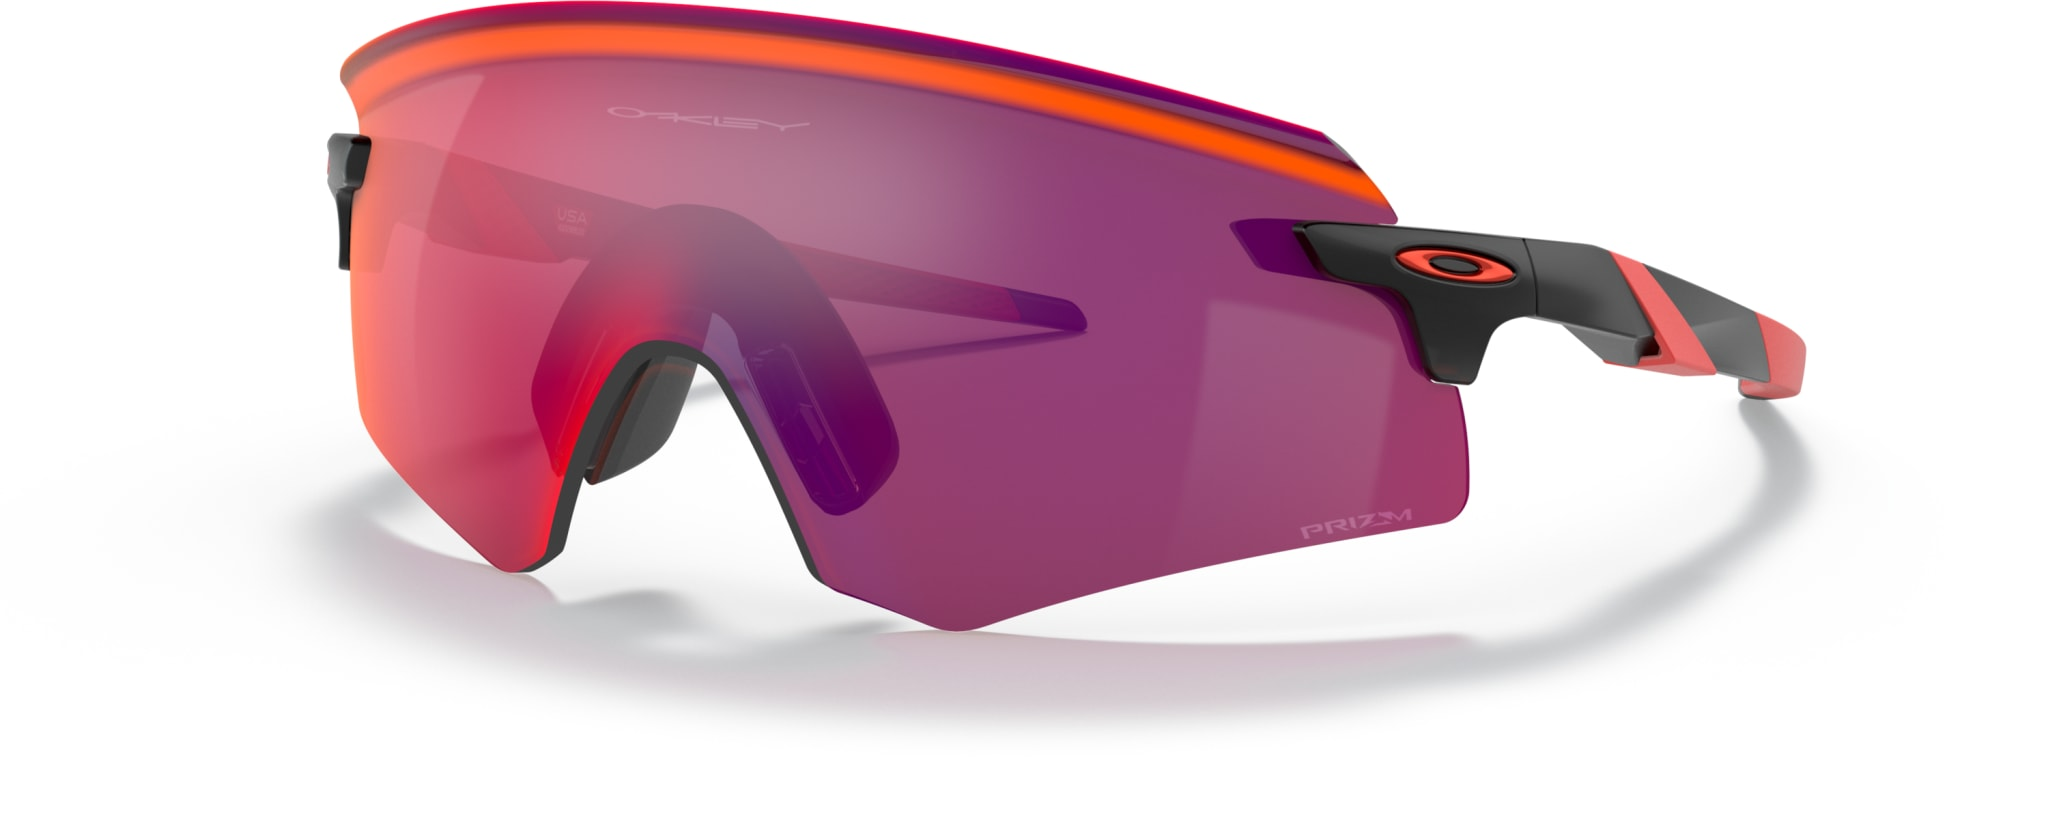 Encoder er Oakley sin nye multisportbrille med et revolusjonerende linsedesign